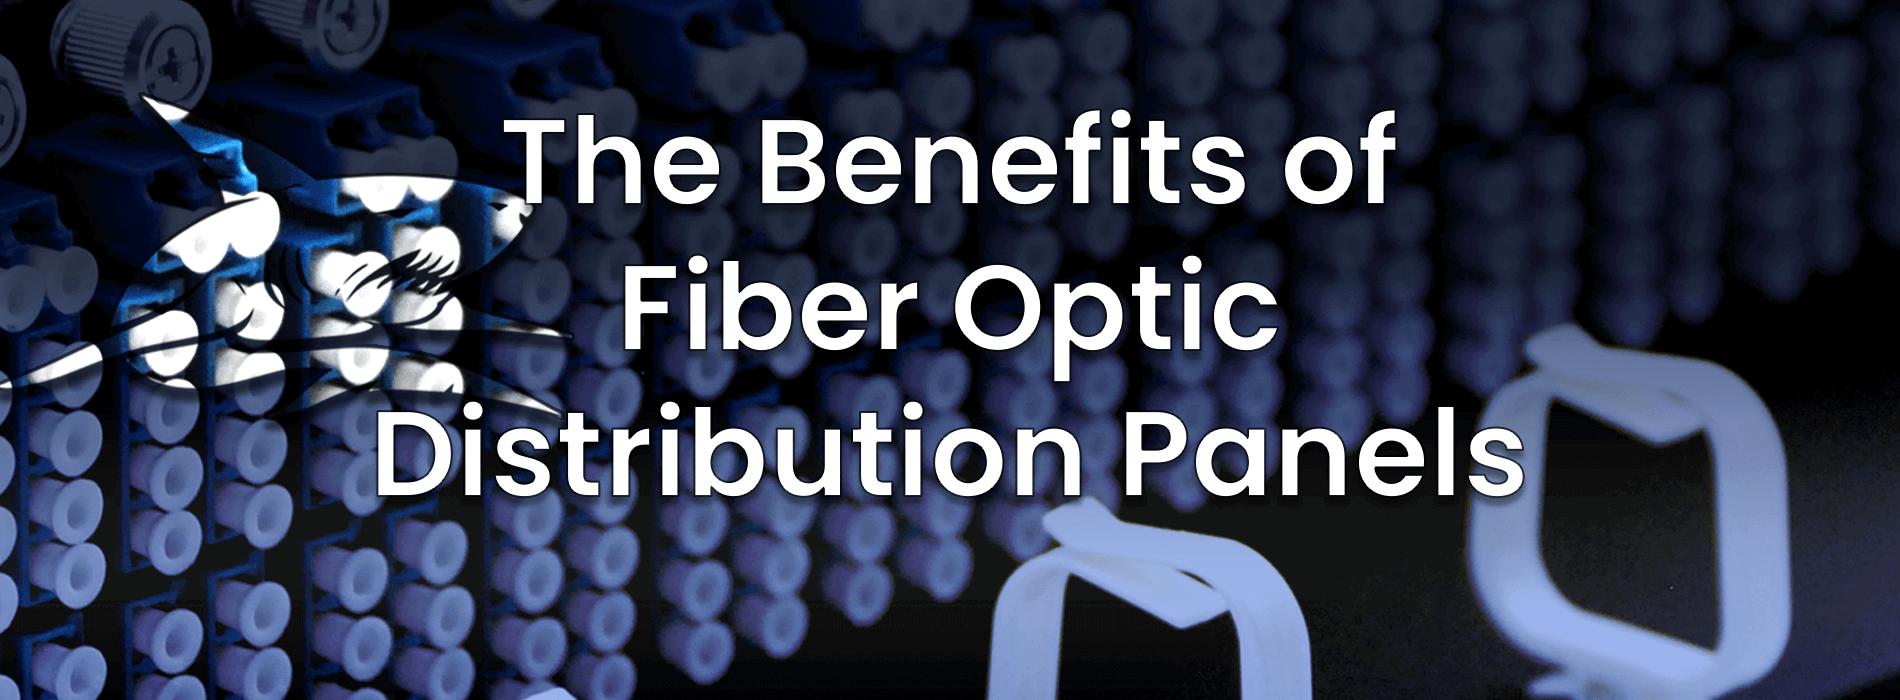 The Benefits of Fiber Optic Distribution Panels